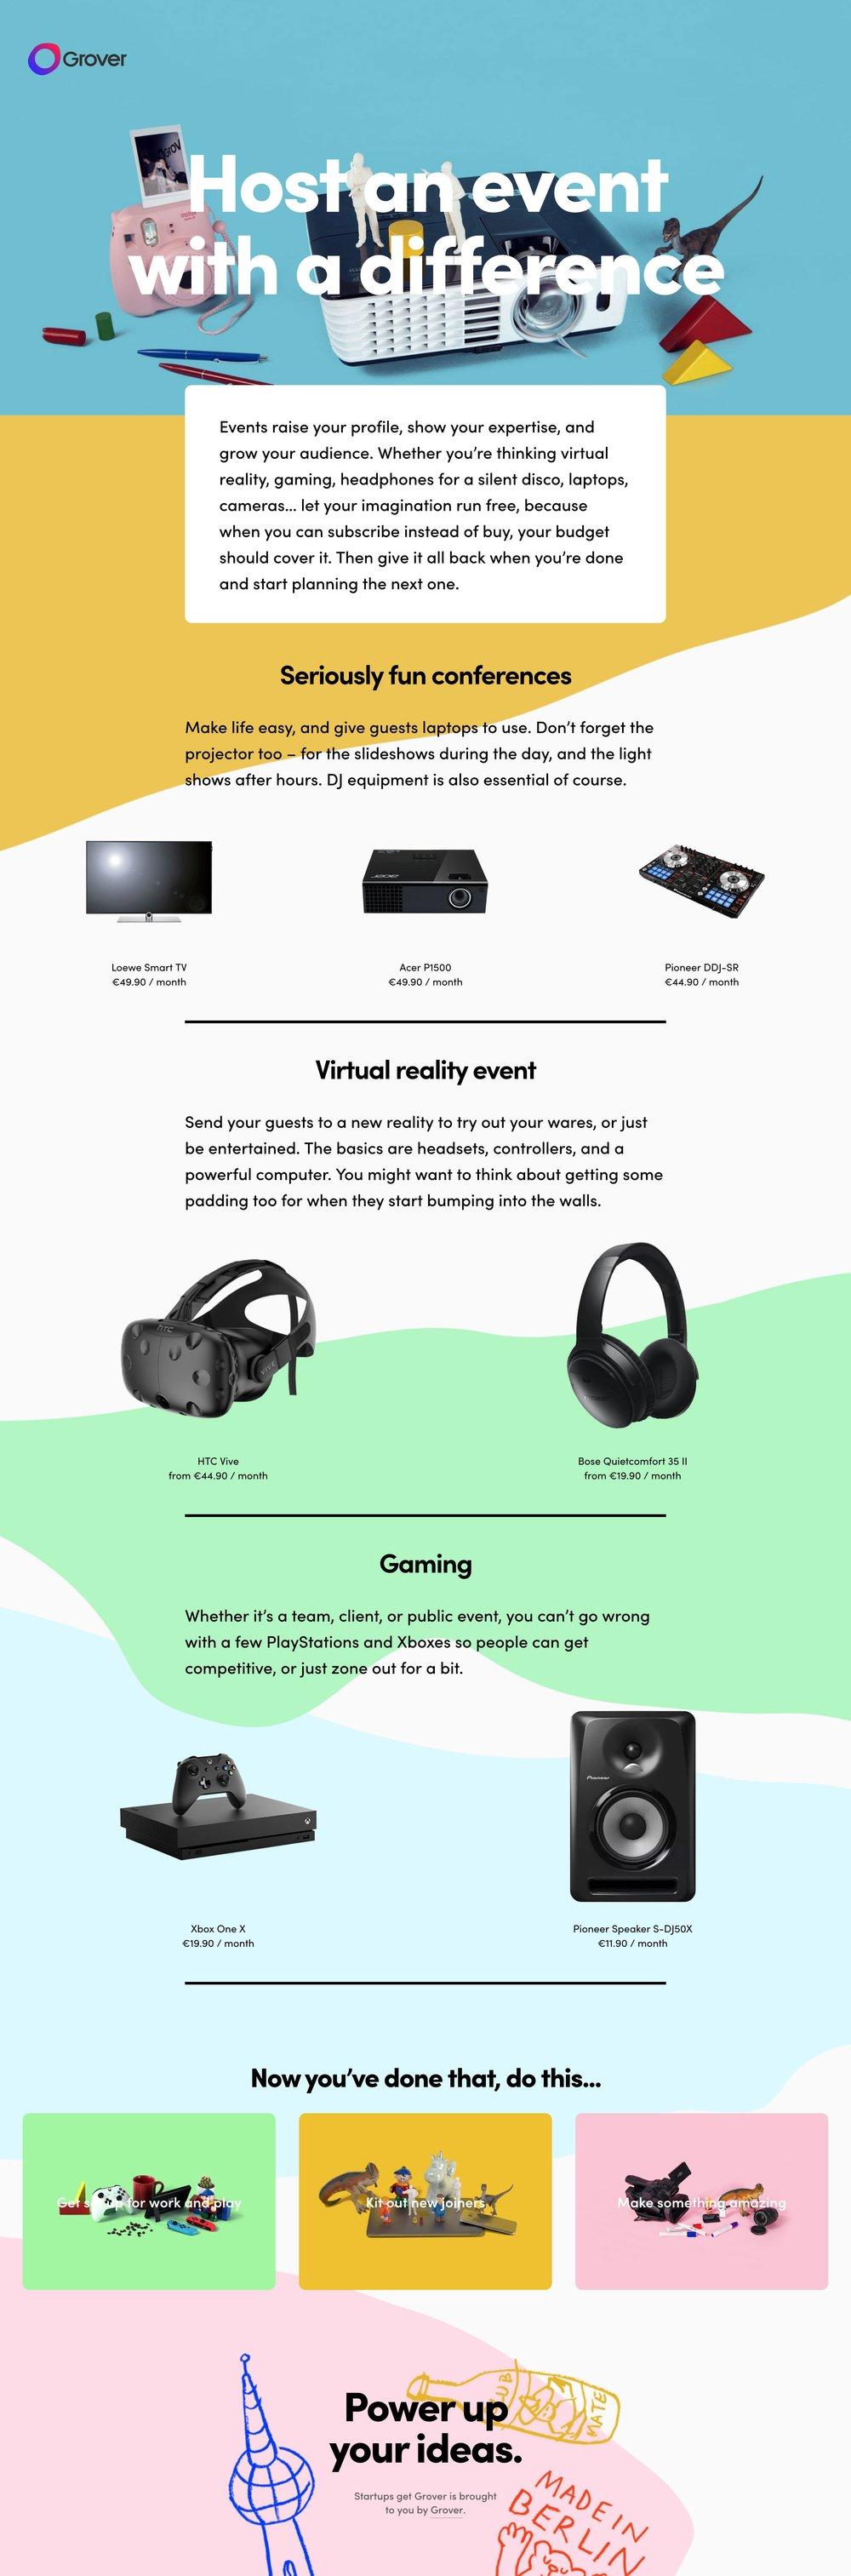 startups-get-grover-2.jpg